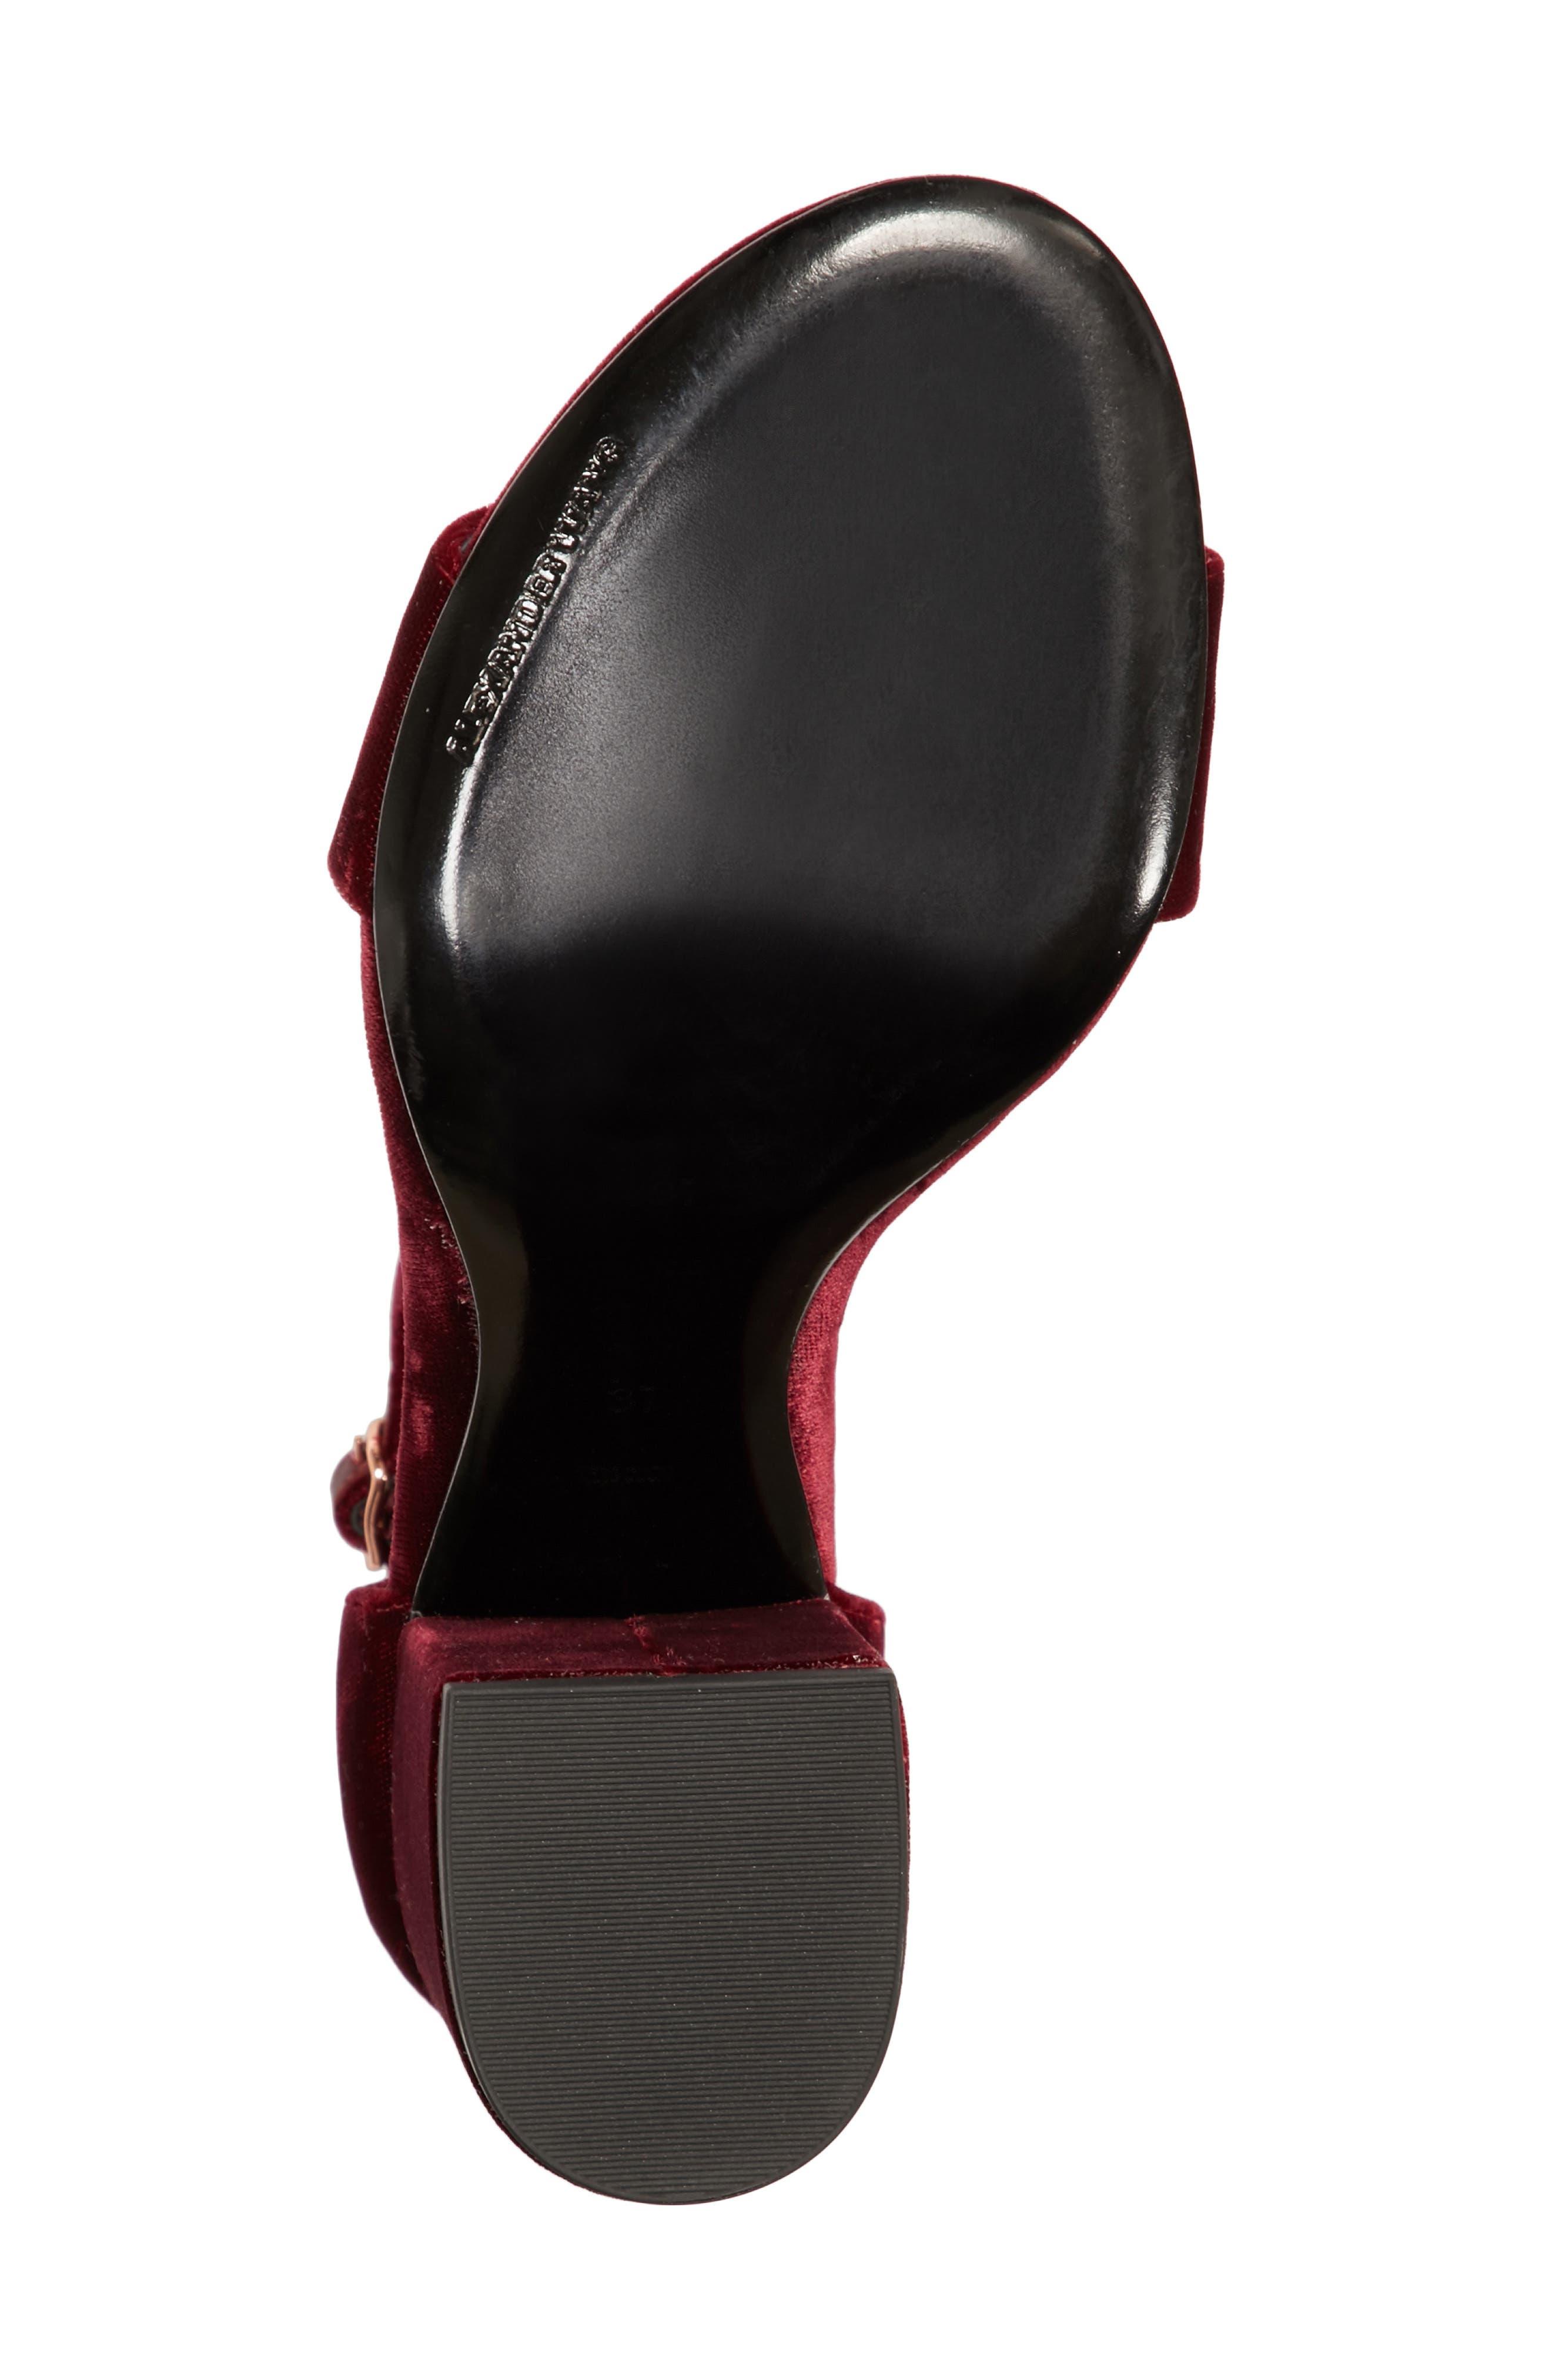 Abby Notch Heel Sandal,                             Alternate thumbnail 6, color,                             930